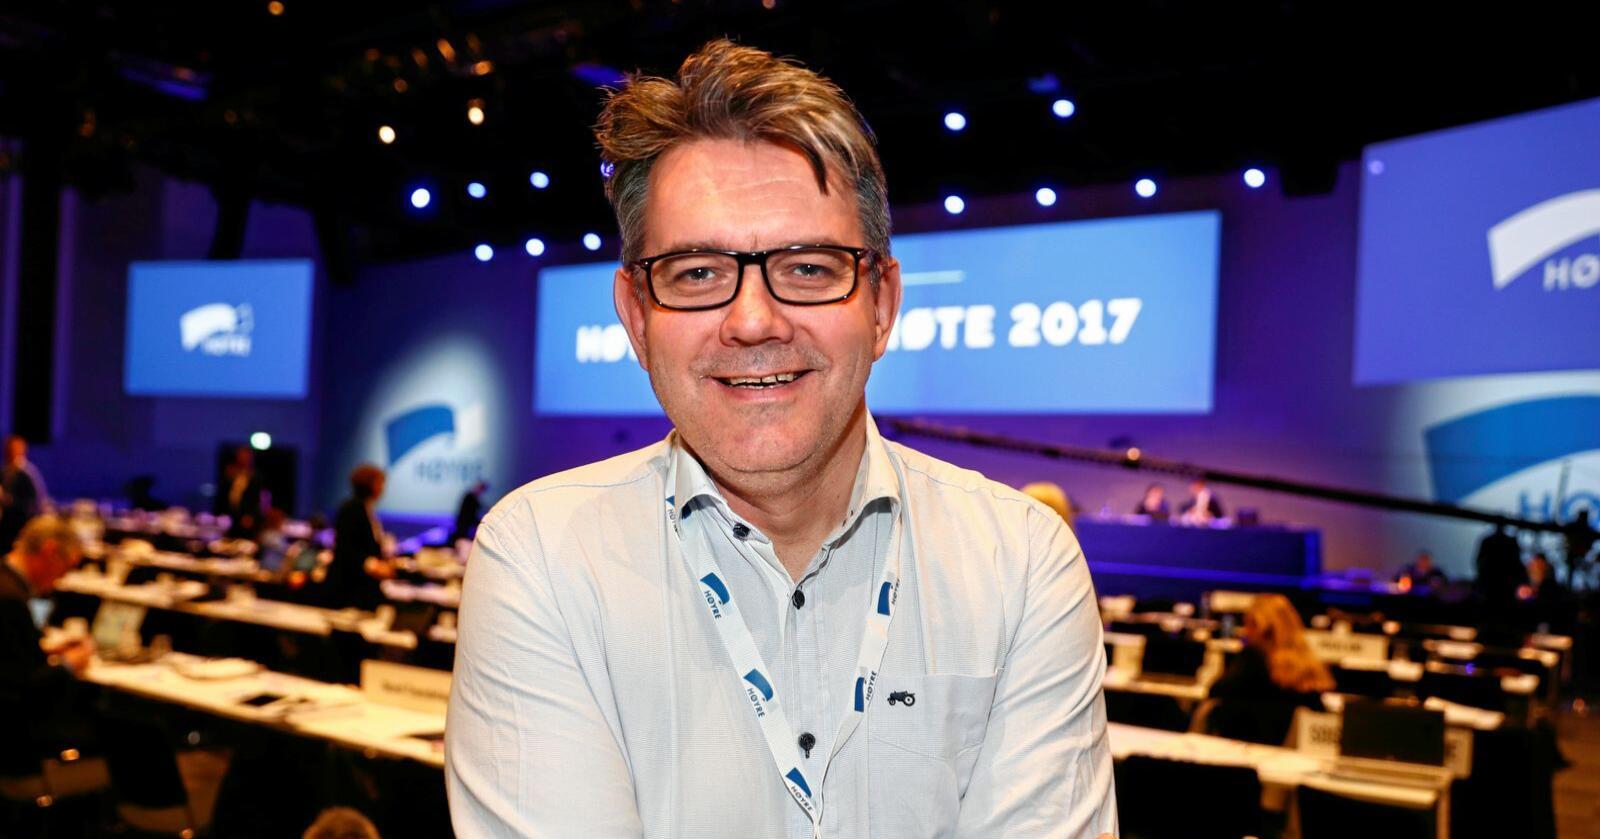 Stortingspolitiker Tom Christer Nilsen (H) vil at flere skal velge torsk i jula. Foto: Terje Pedersen / NTB scanpix